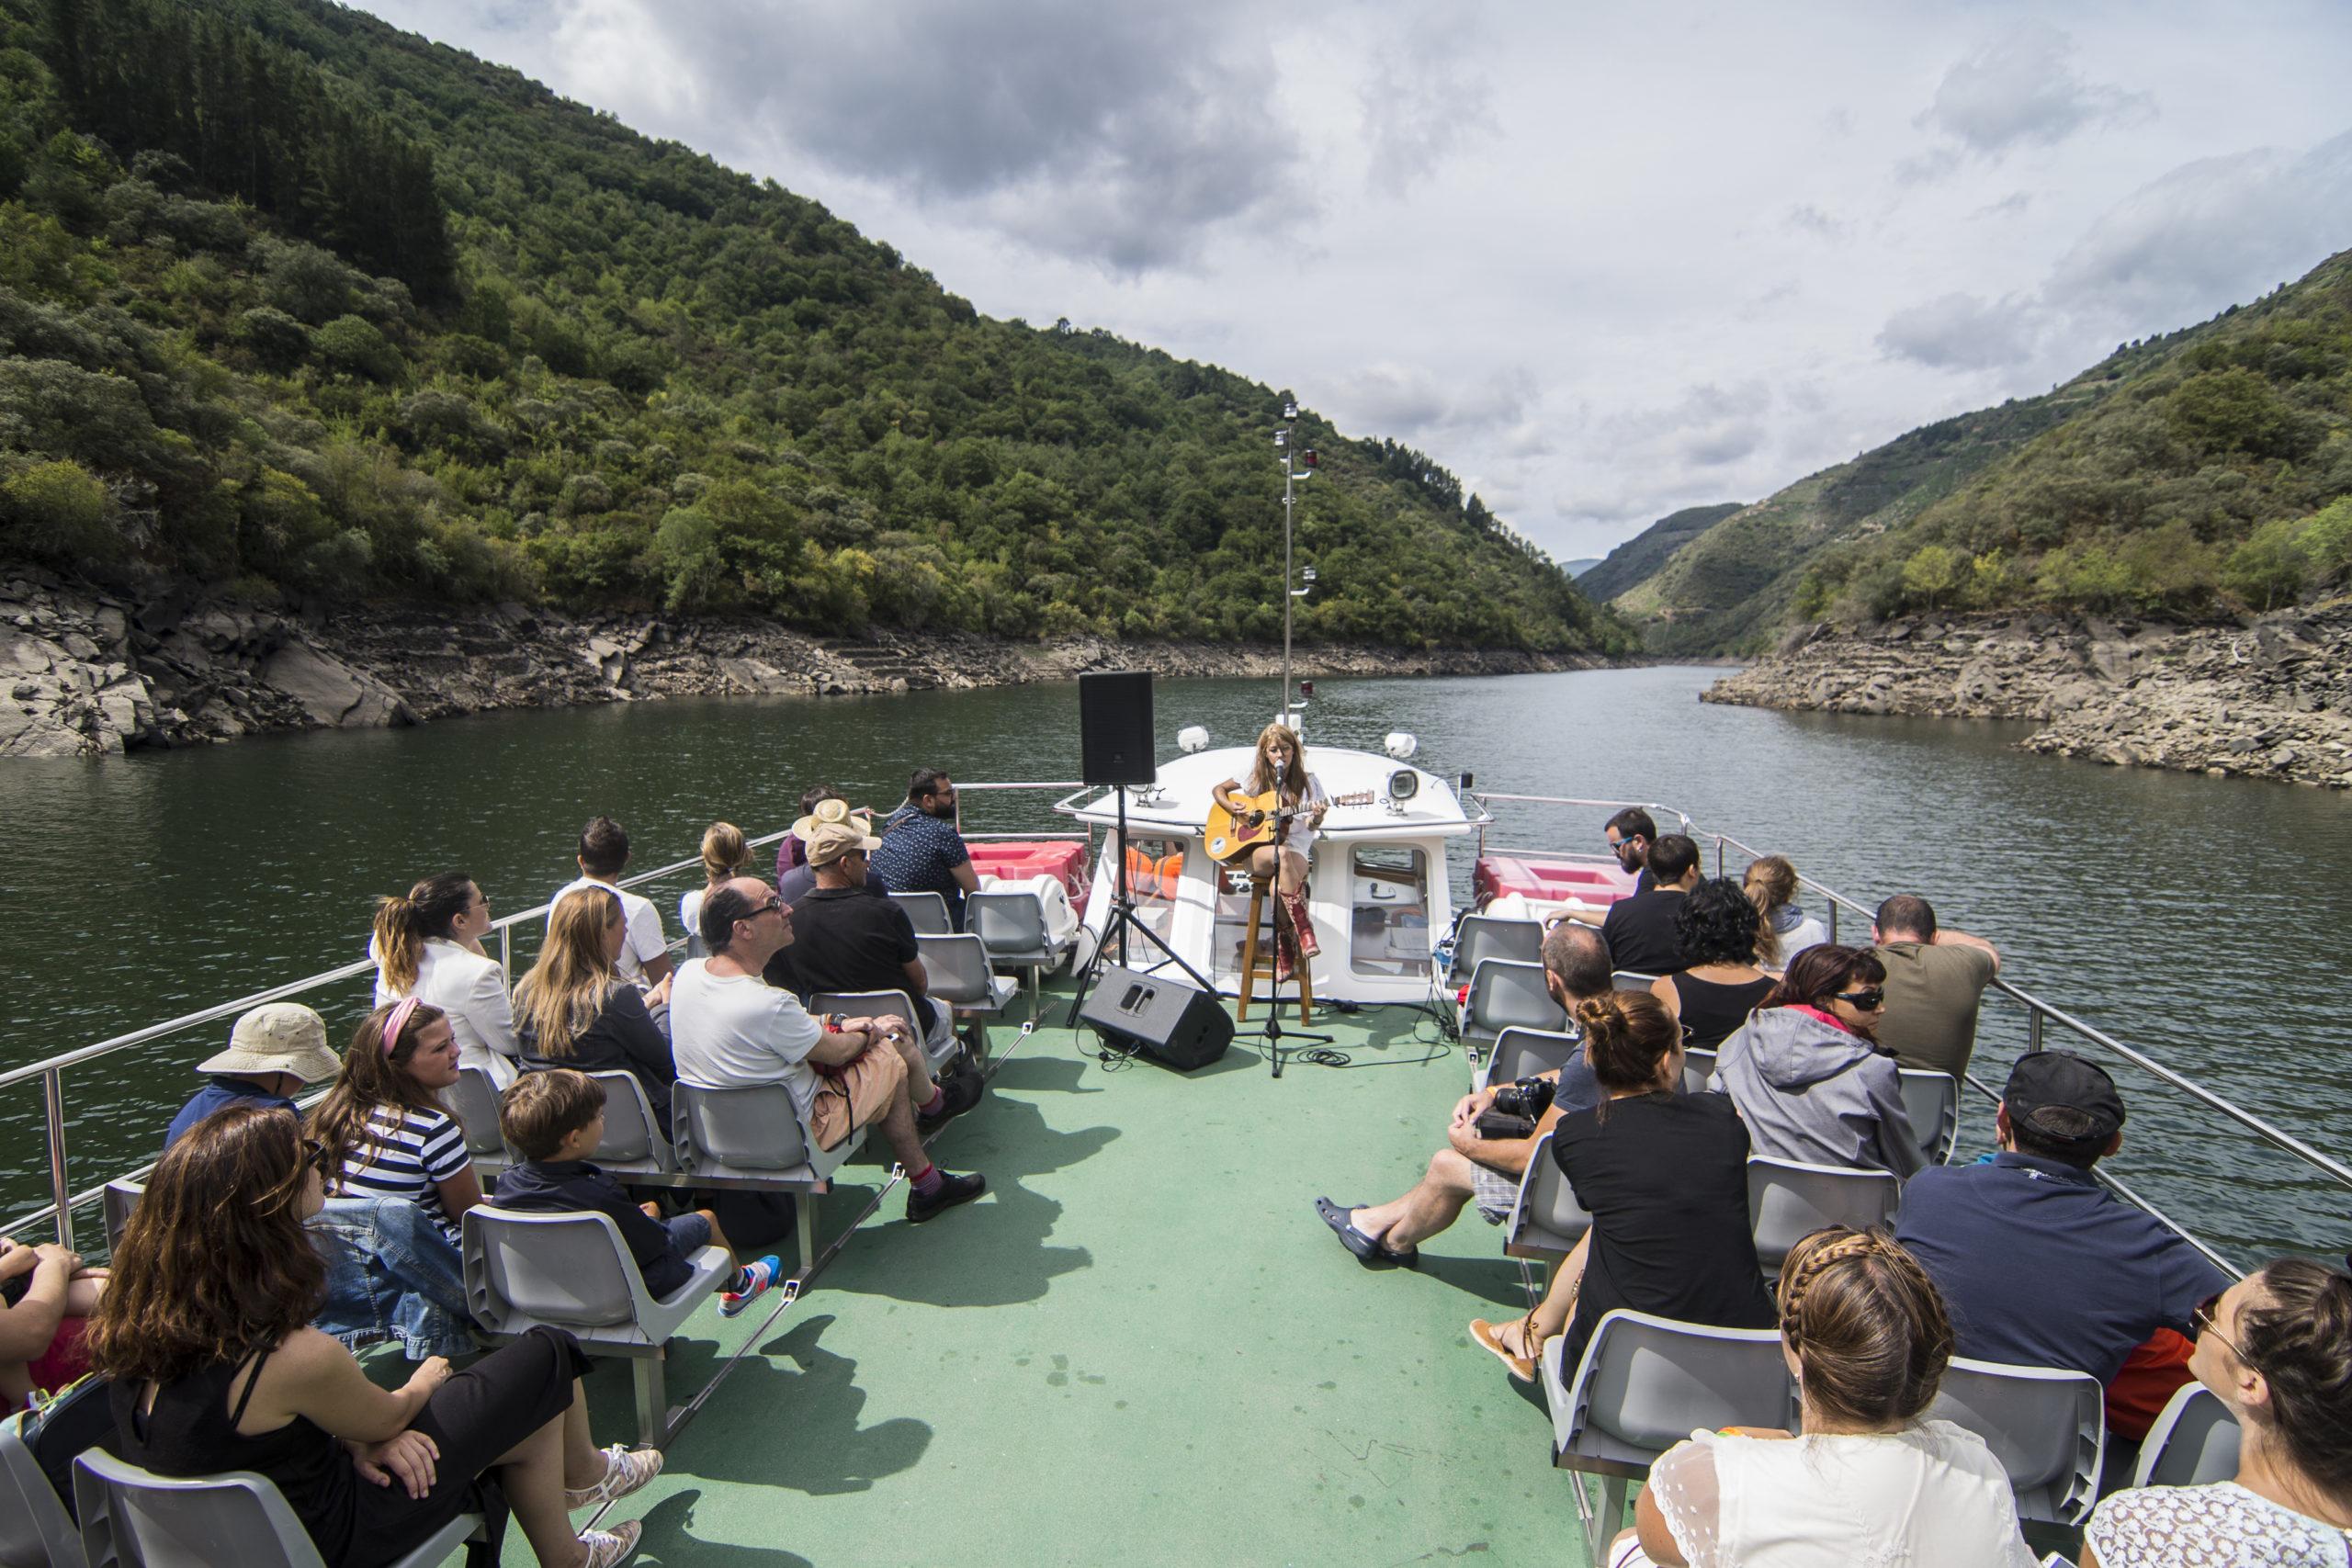 Catamarán Ponte do Sil